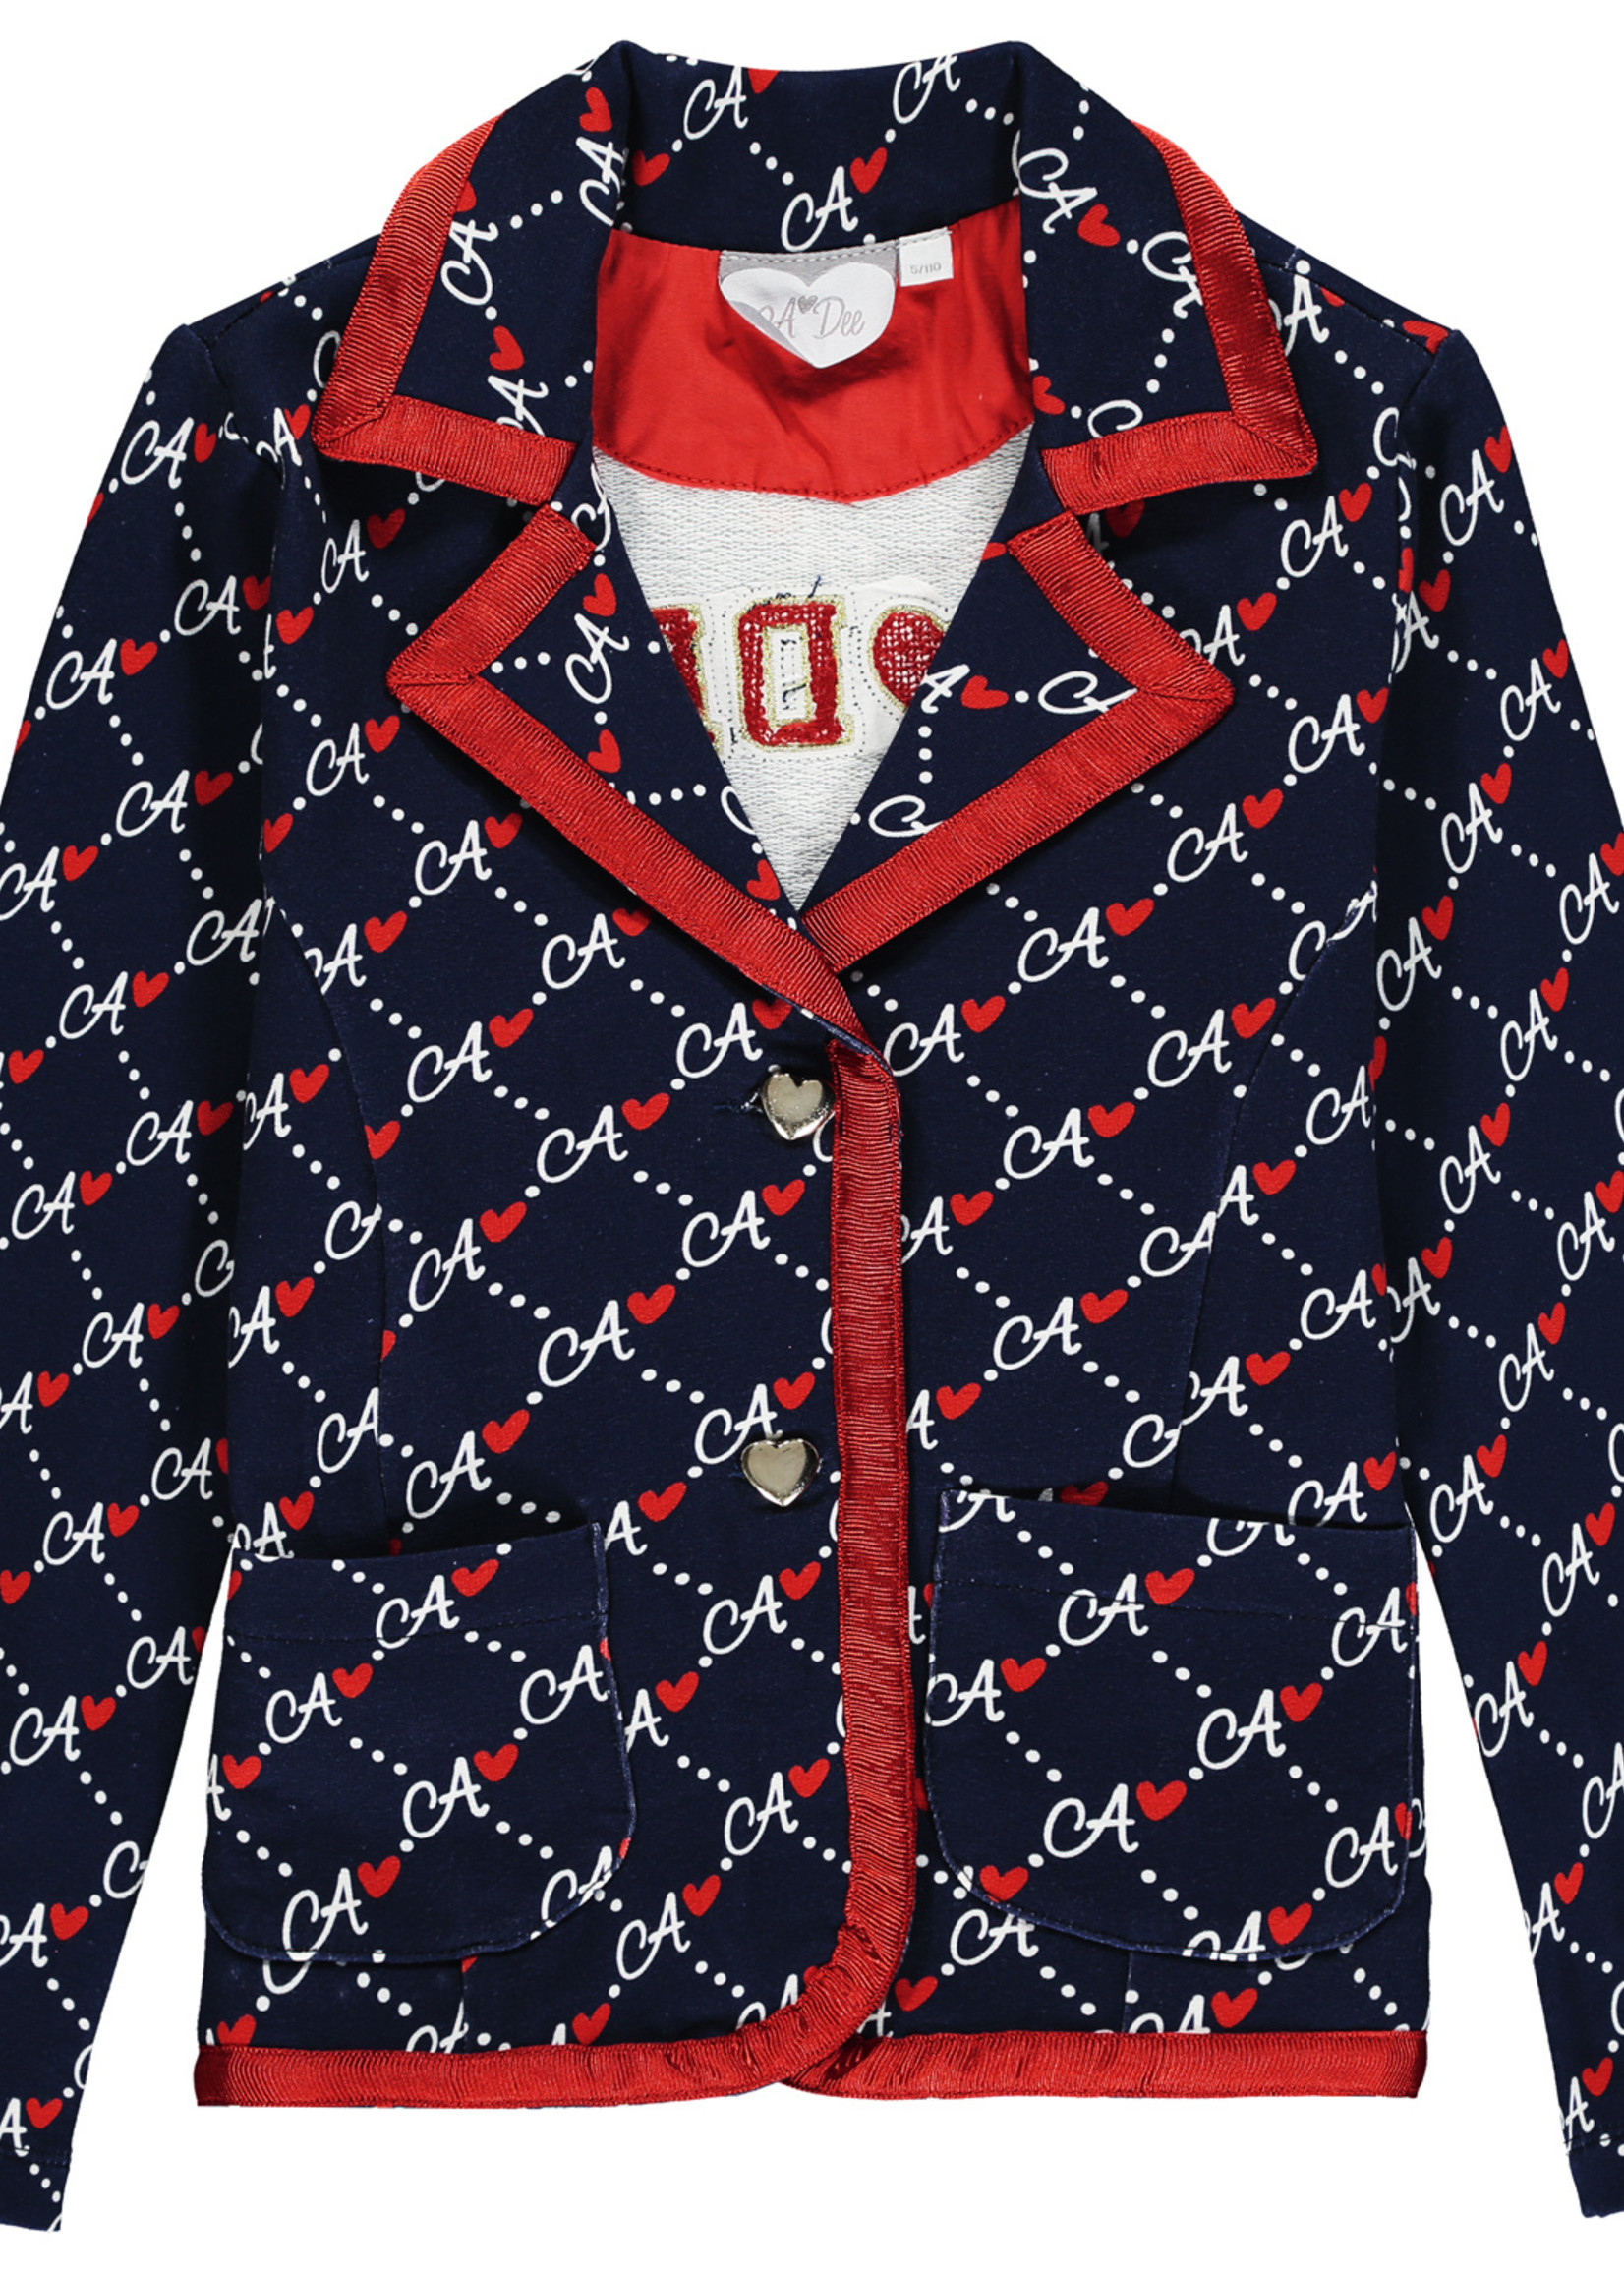 A Dee Maggy diamond print blazer